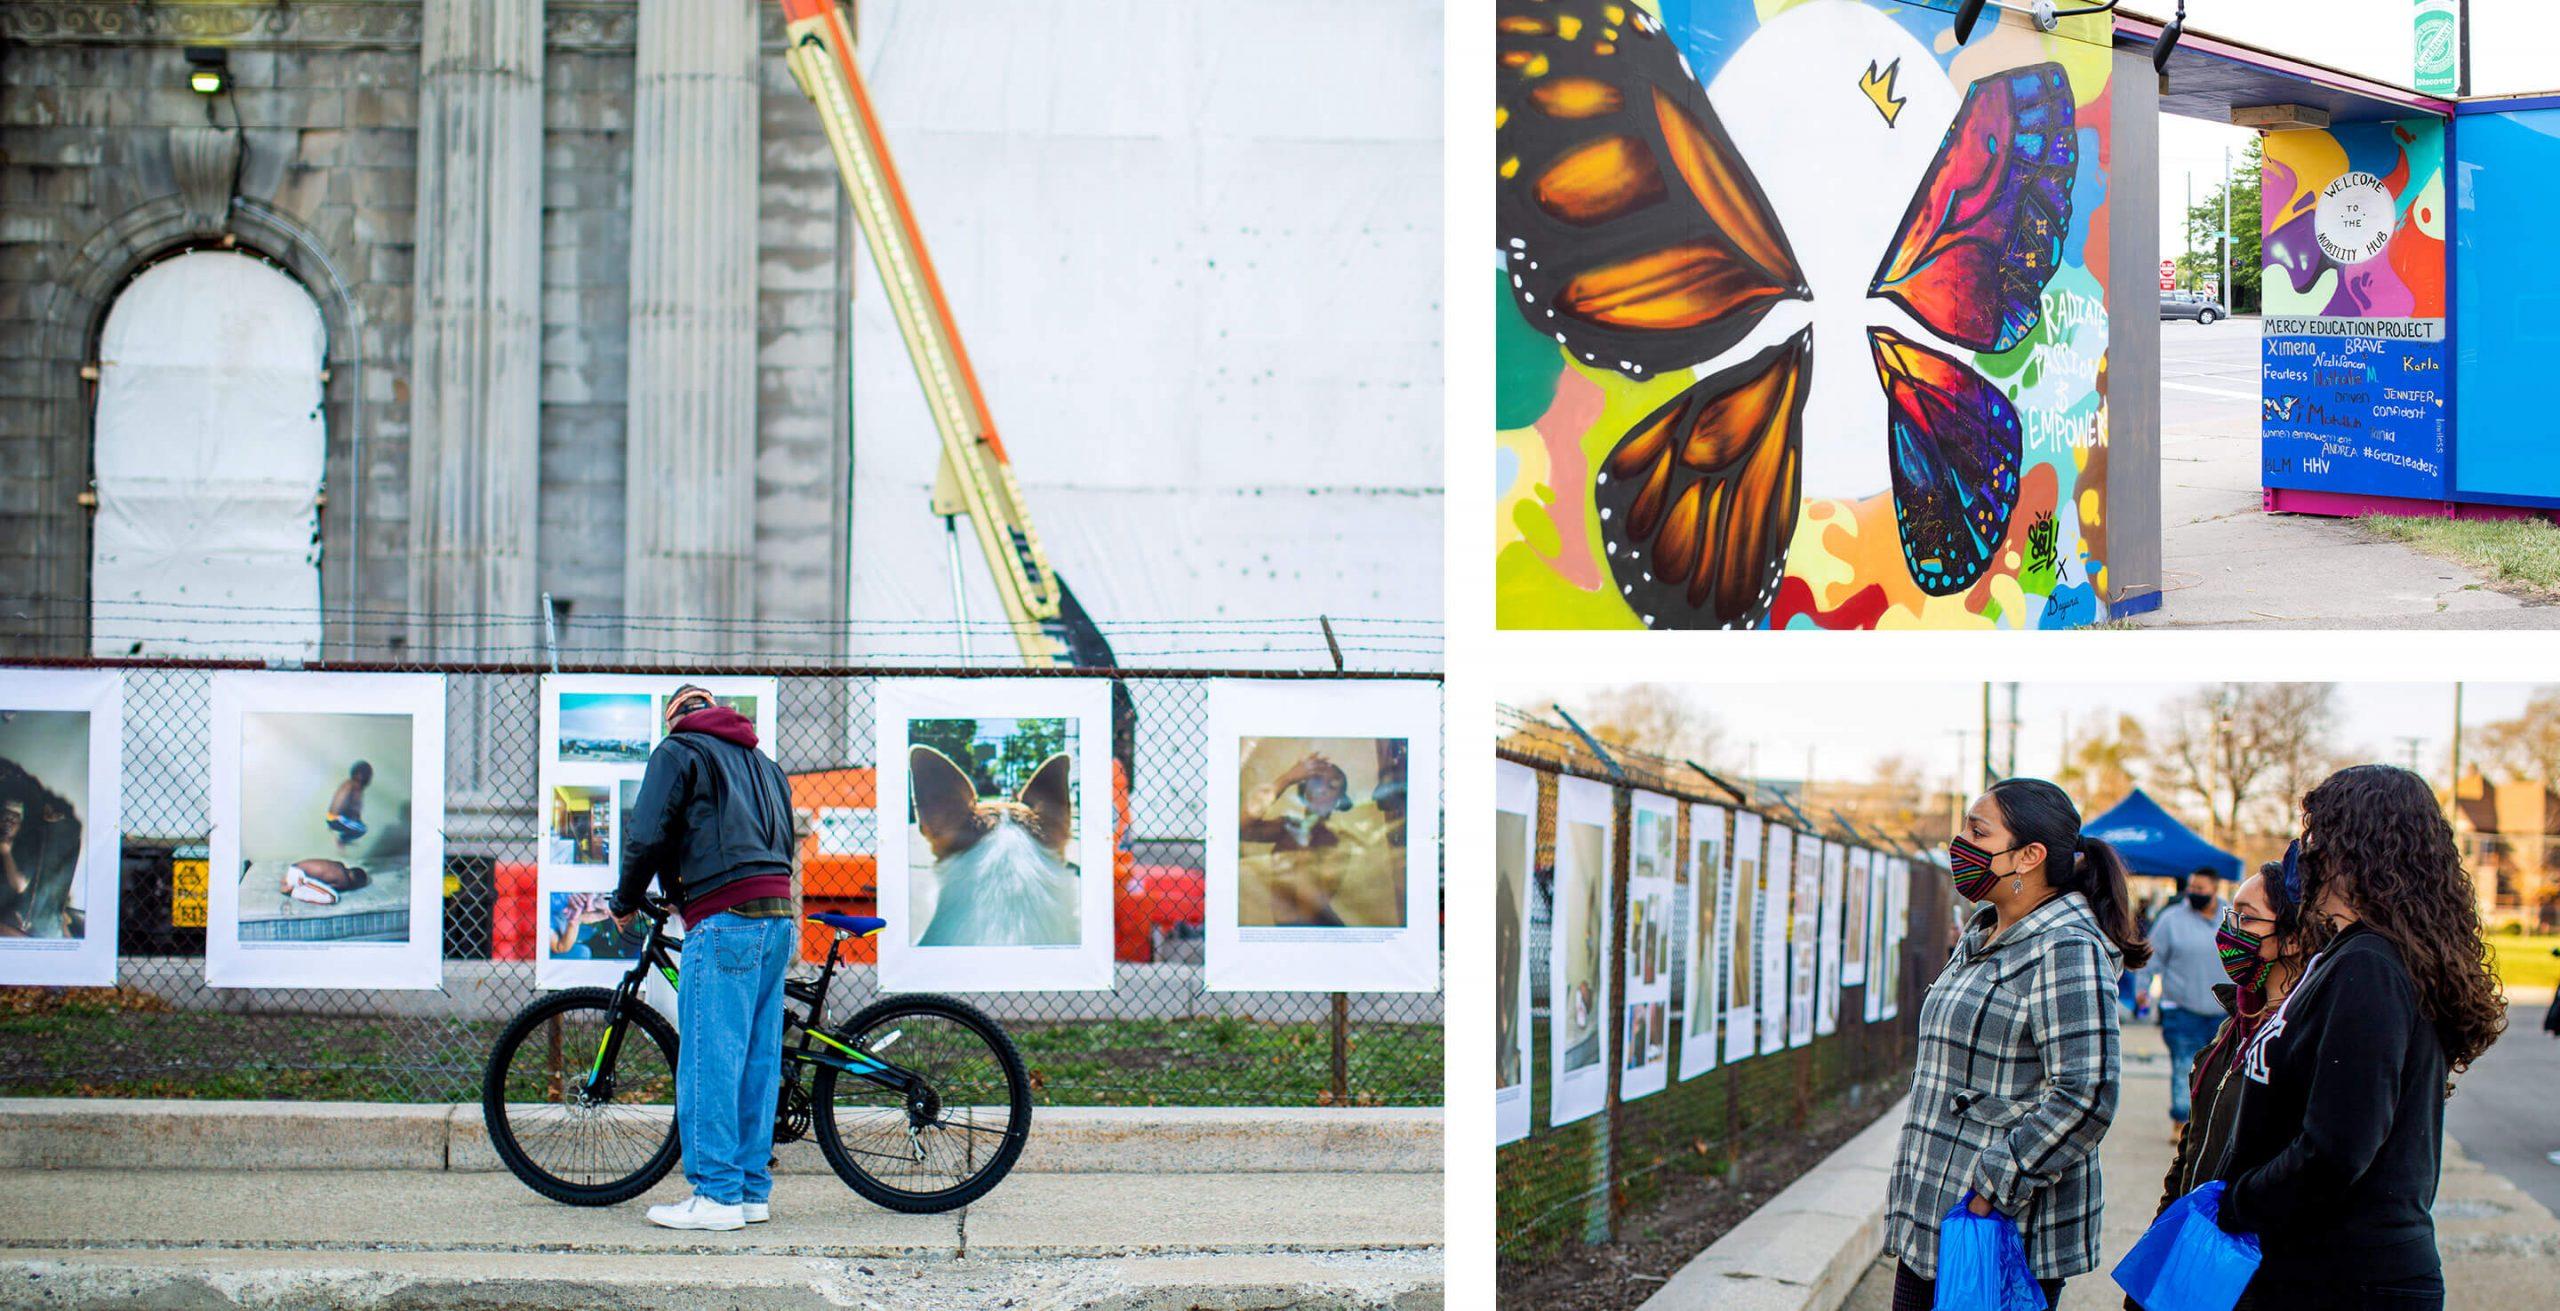 art exhibits at Michigan Central